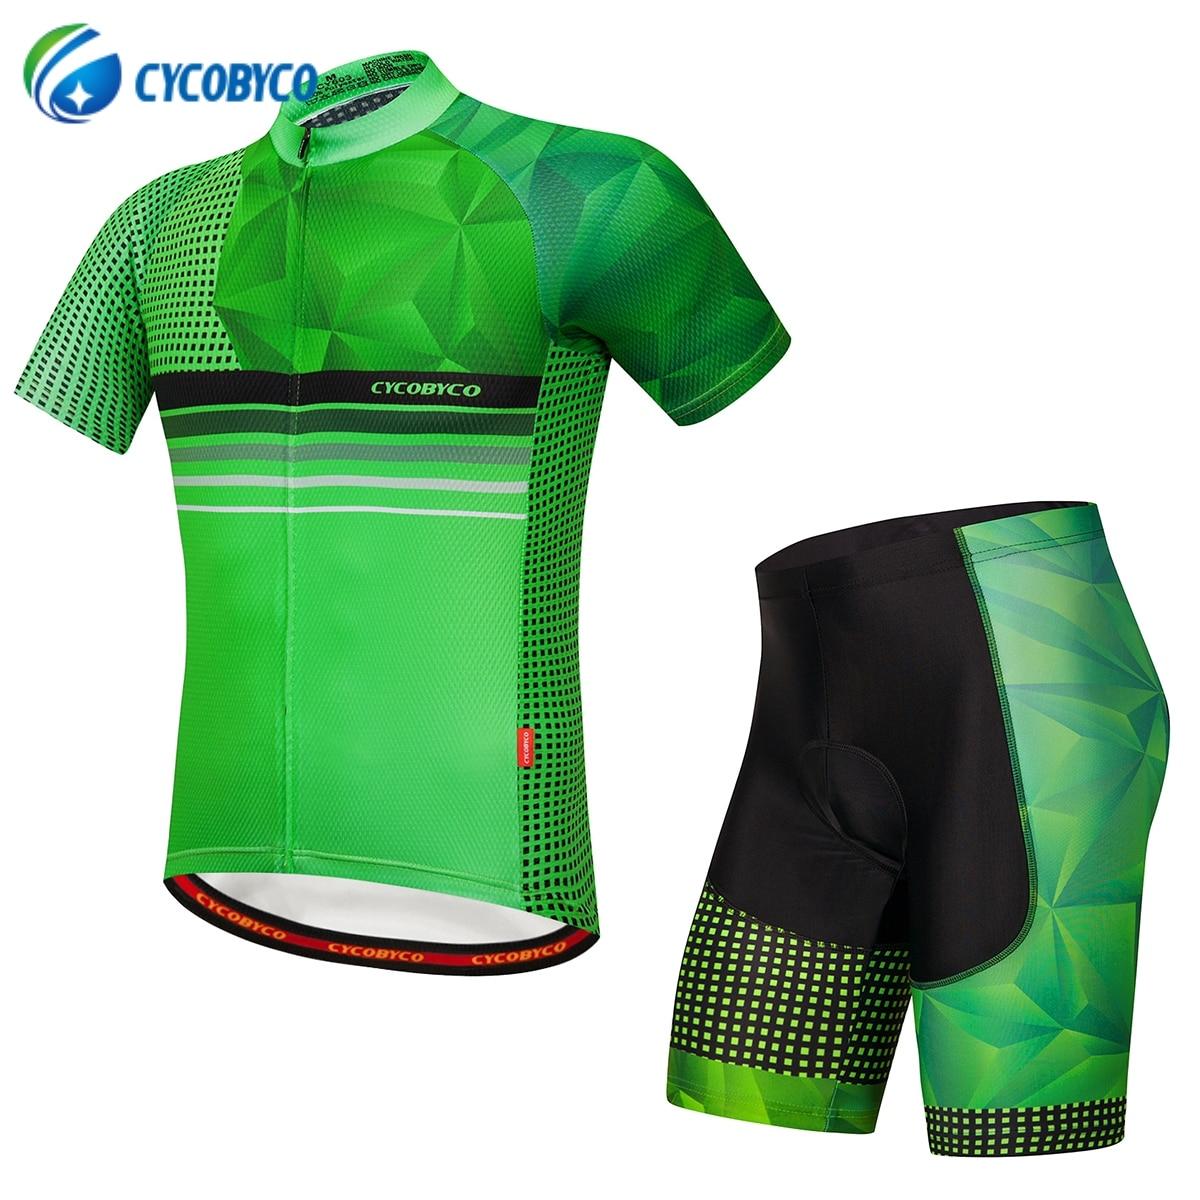 Cycobyco Radfahren Jersey Kurzarm Männer MTB Fahrrad Bekleidung Set Rennrad Fahrrad Shorts Gepolsterte Fluoreszenz Maillot Ropa Ciclismo